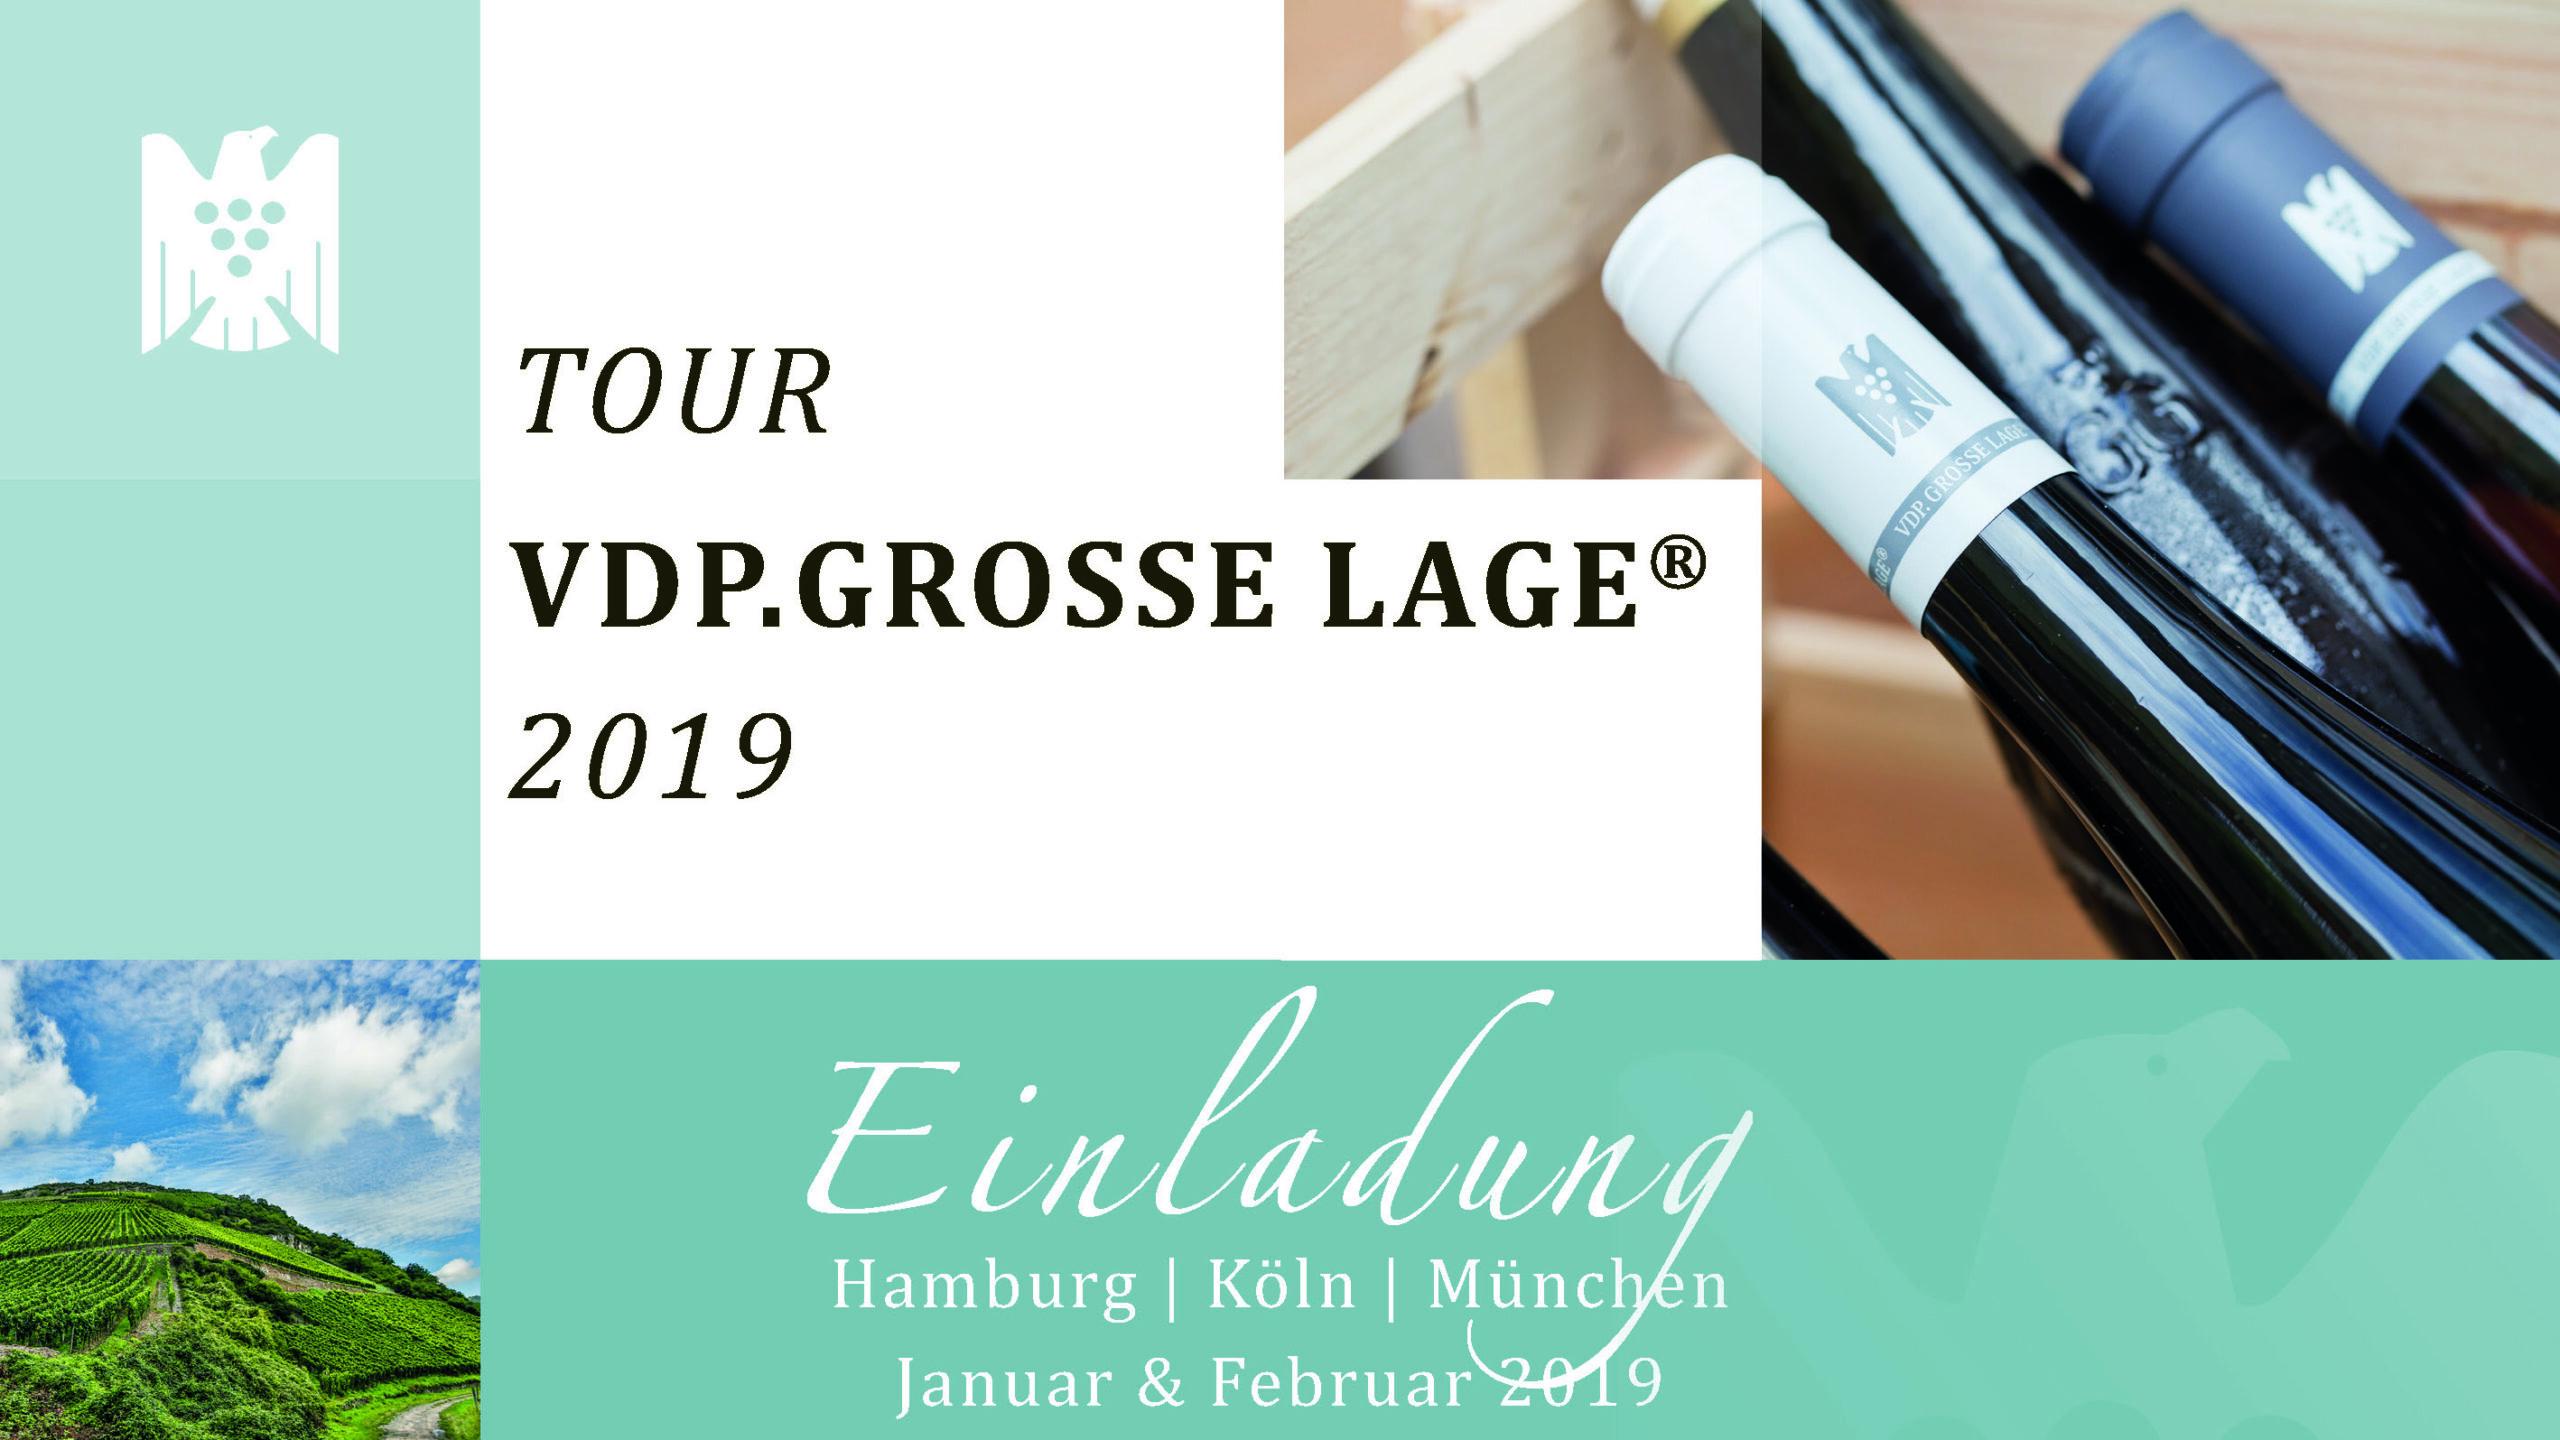 VDP.GROSSE LAGE on Tour - München